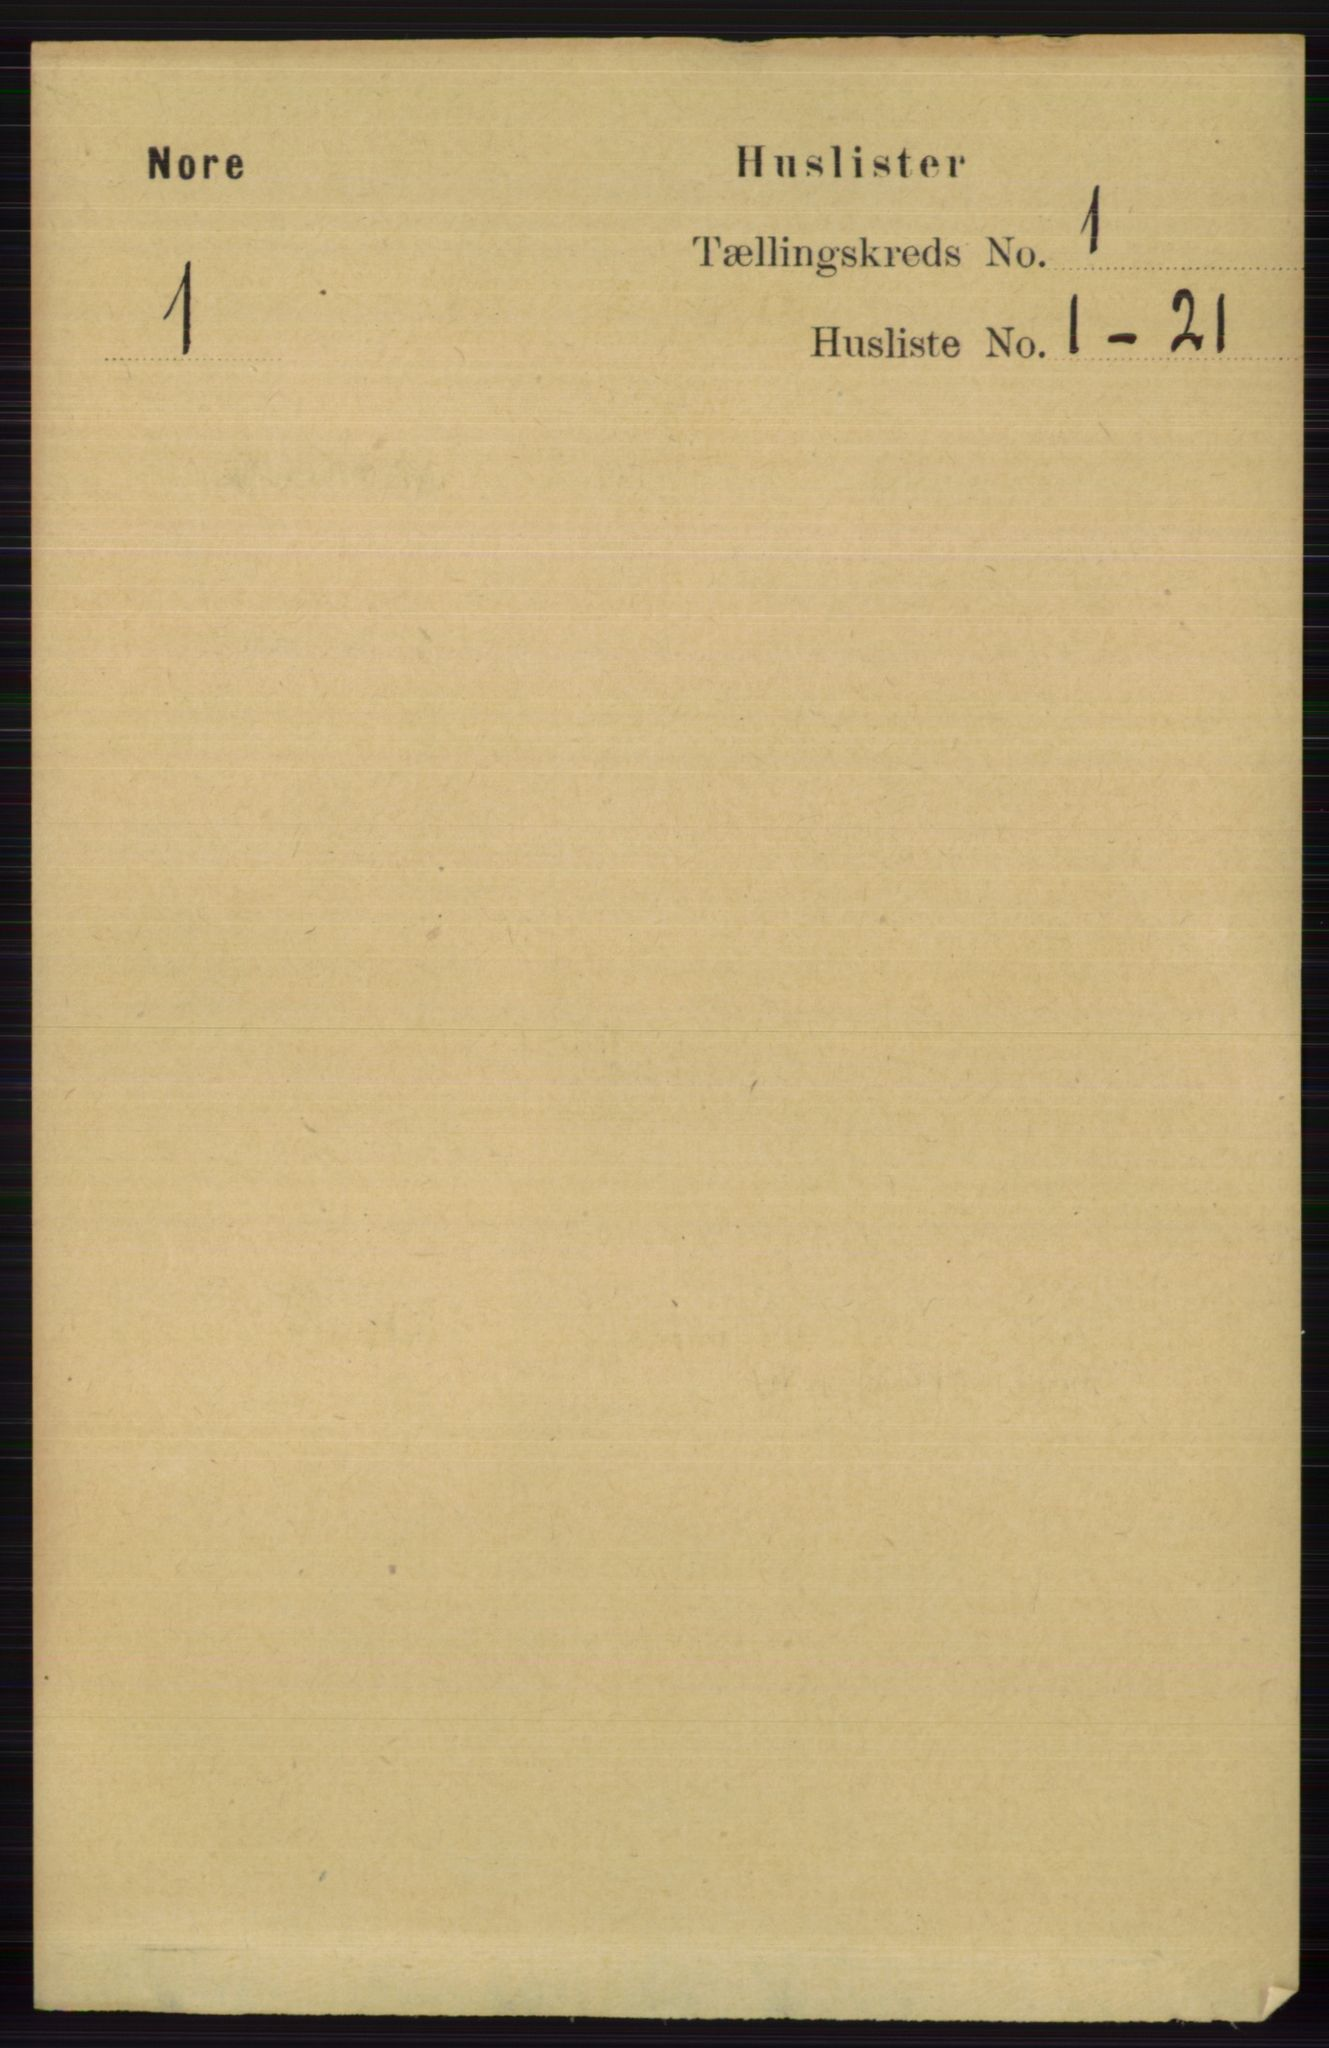 RA, Folketelling 1891 for 0633 Nore herred, 1891, s. 32